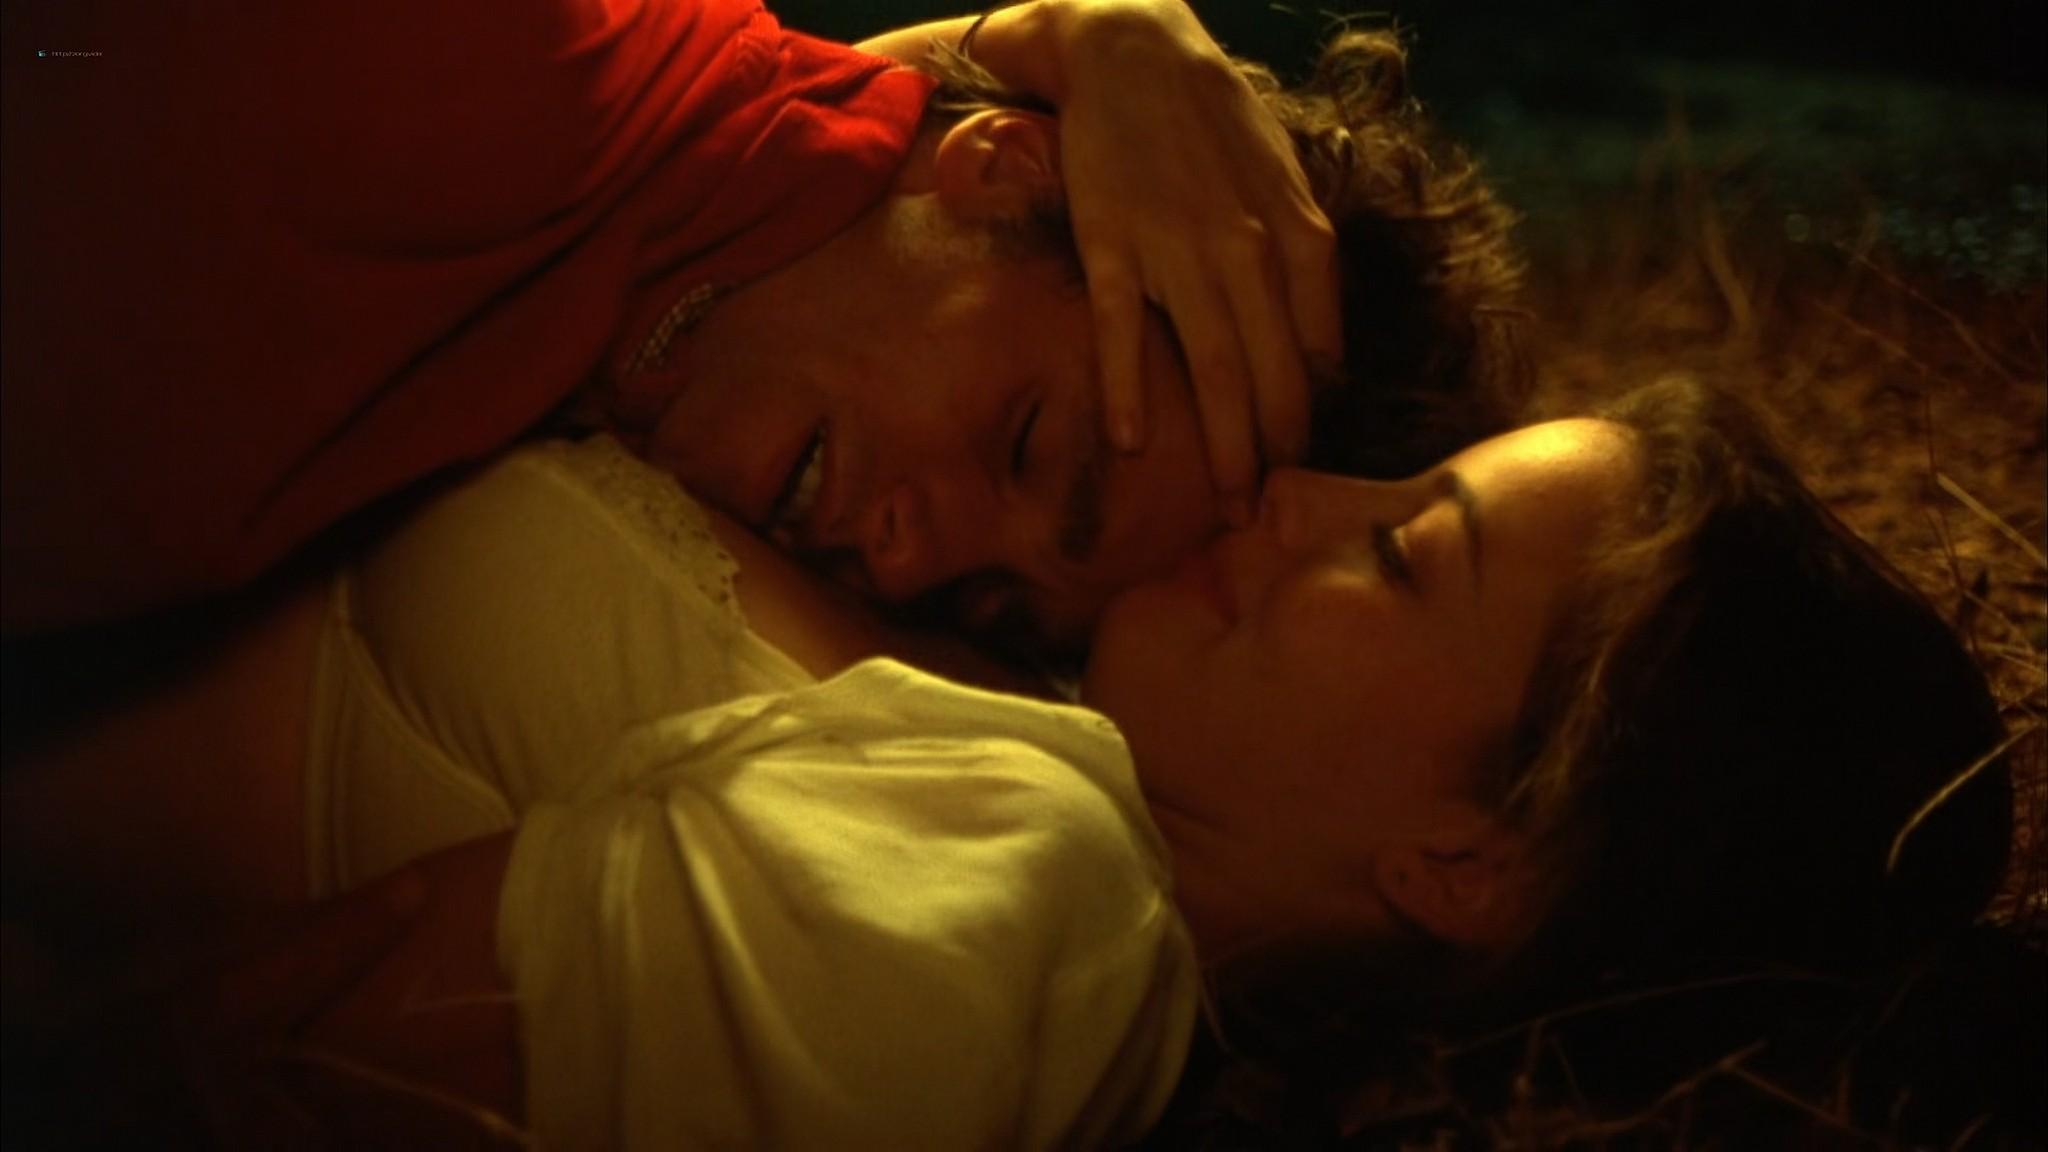 Liv Tyler nude Rachel Weisz Sinead Cusack nude and hot Stealing Beauty 1996 1080p Web 25